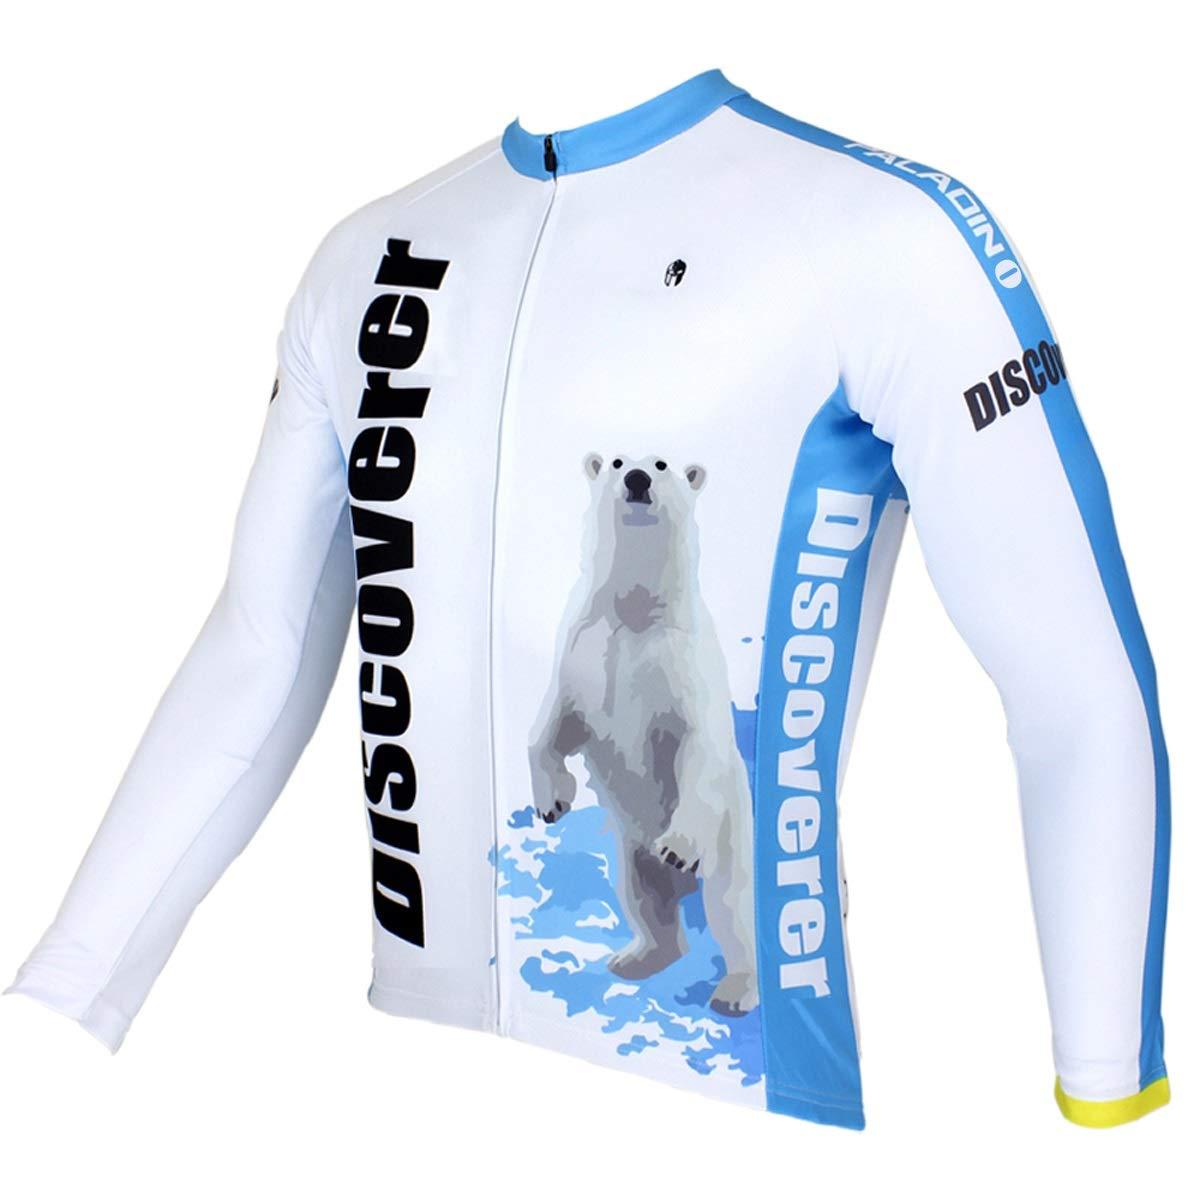 Frühling und Sommer langärmelige Jersey-Jacke Wicking Cycling Professional Schnelltrocknender Fahrrad-Reitanzug Fahrradtrikot LPLHJD